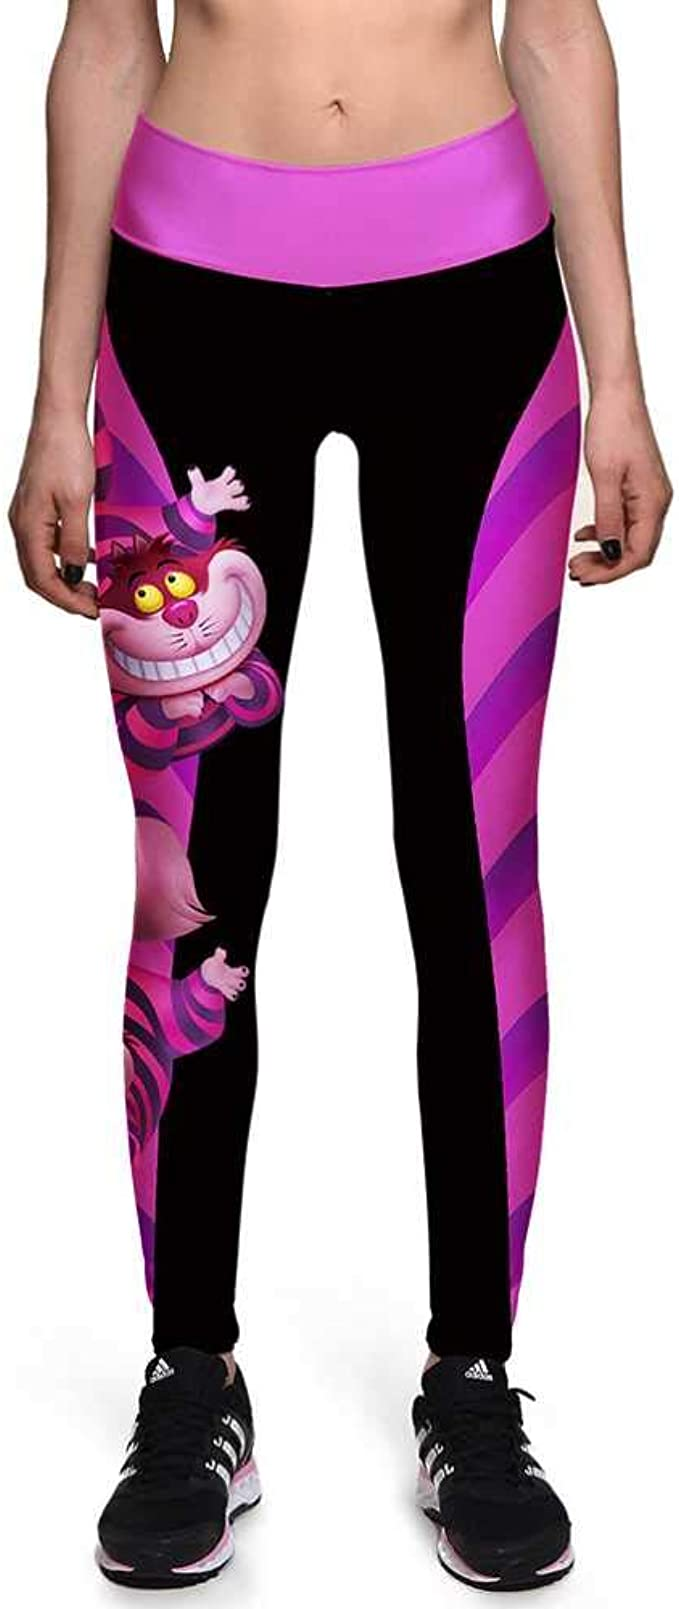 YSHJF Otoño Invierno Leggings Mujeres Sonrisa Gato Dibujos Animados Impreso Mujeres Leggings Cintura Alta Leggins Fitness Workout Yoga Pantalones: Amazon.es: Ropa y accesorios